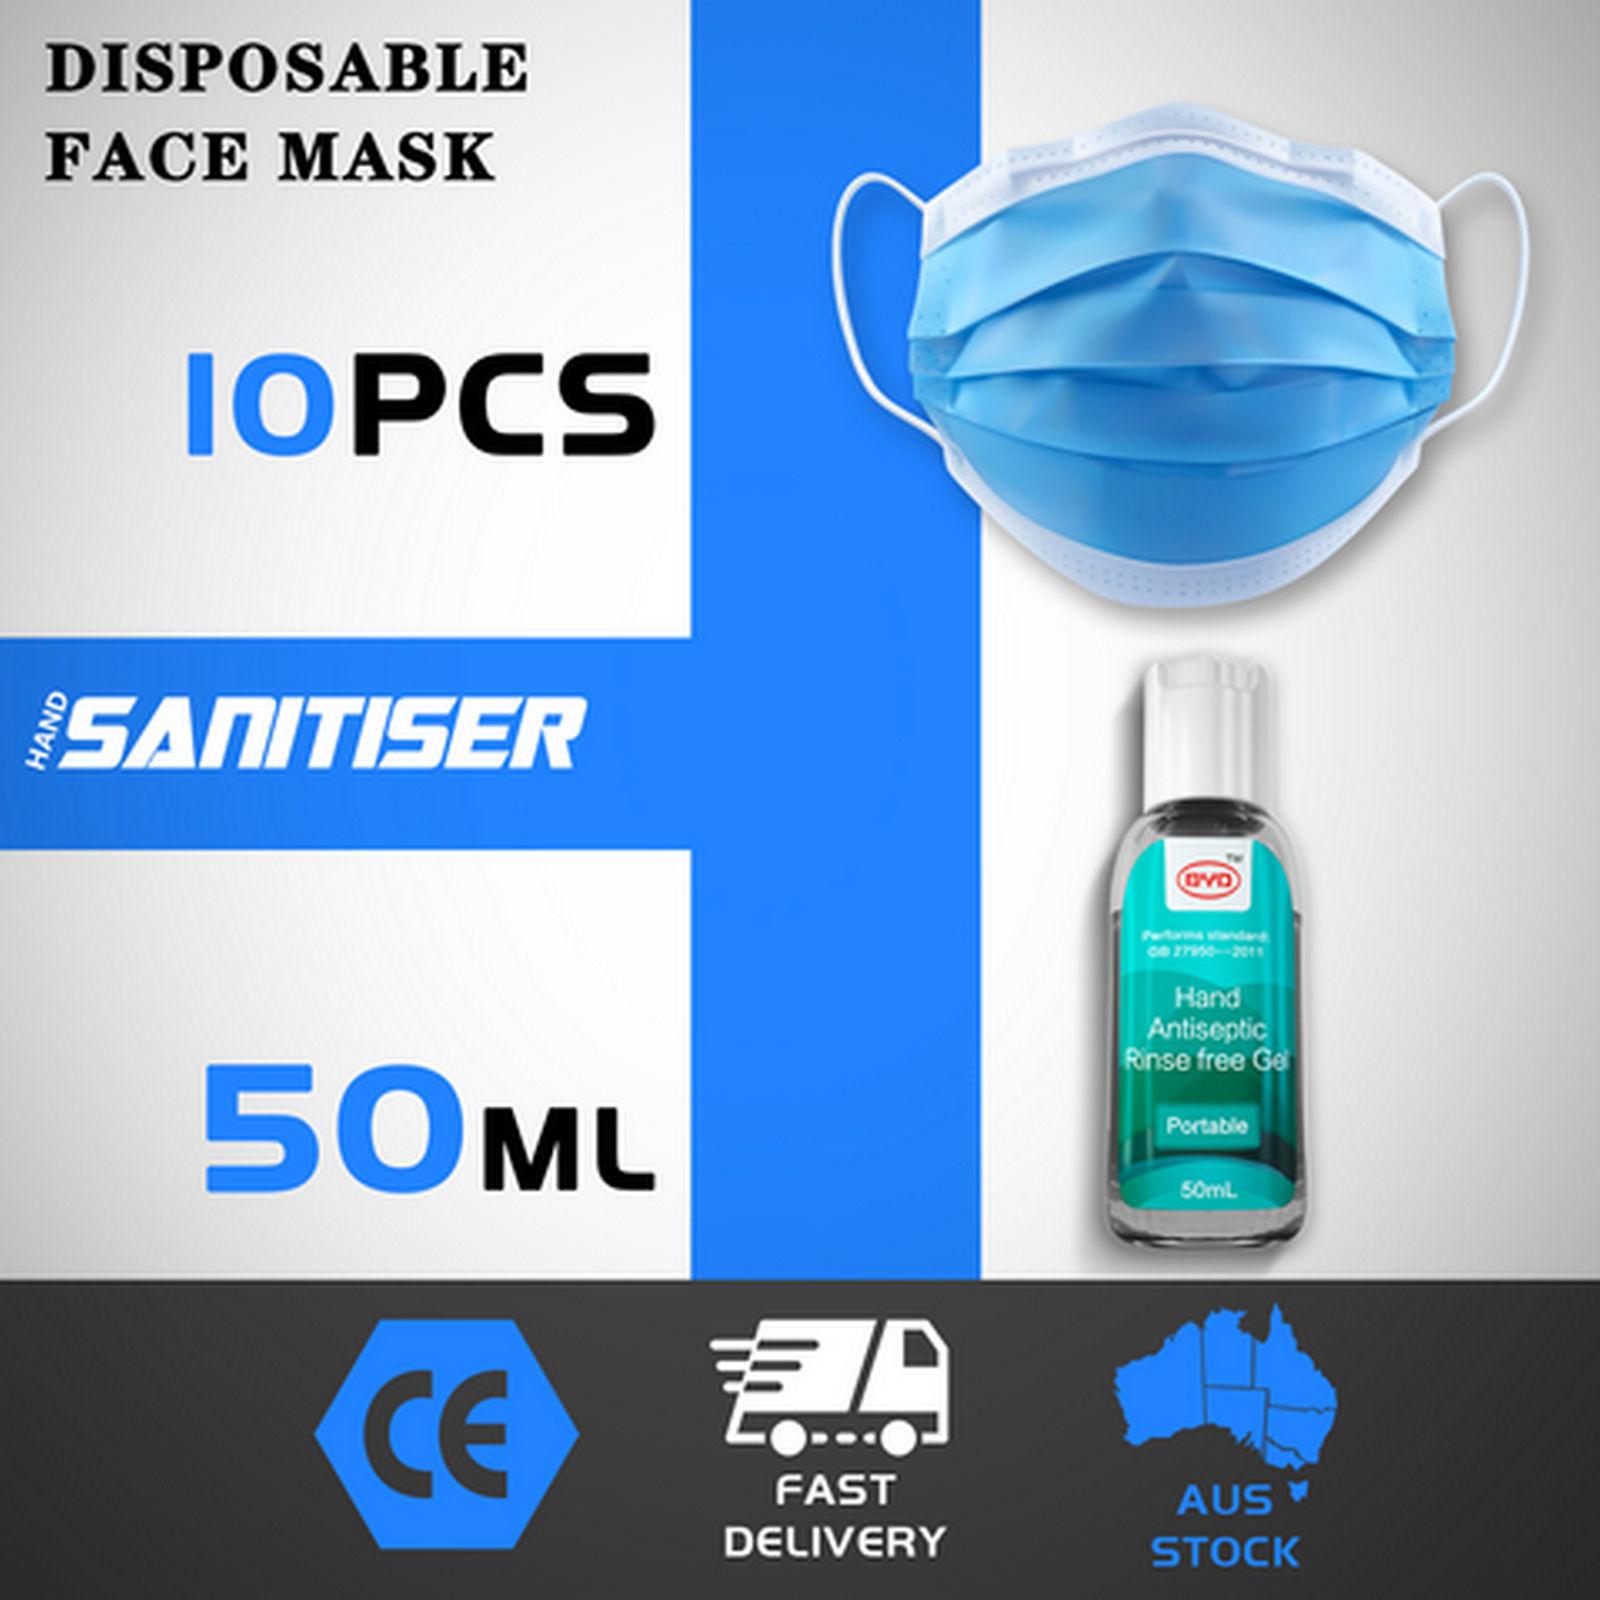 thumbnail 50 - 50/100pcs Disposable Face Mask Protective Mouth Masks 3 Layer Meltblown Filter